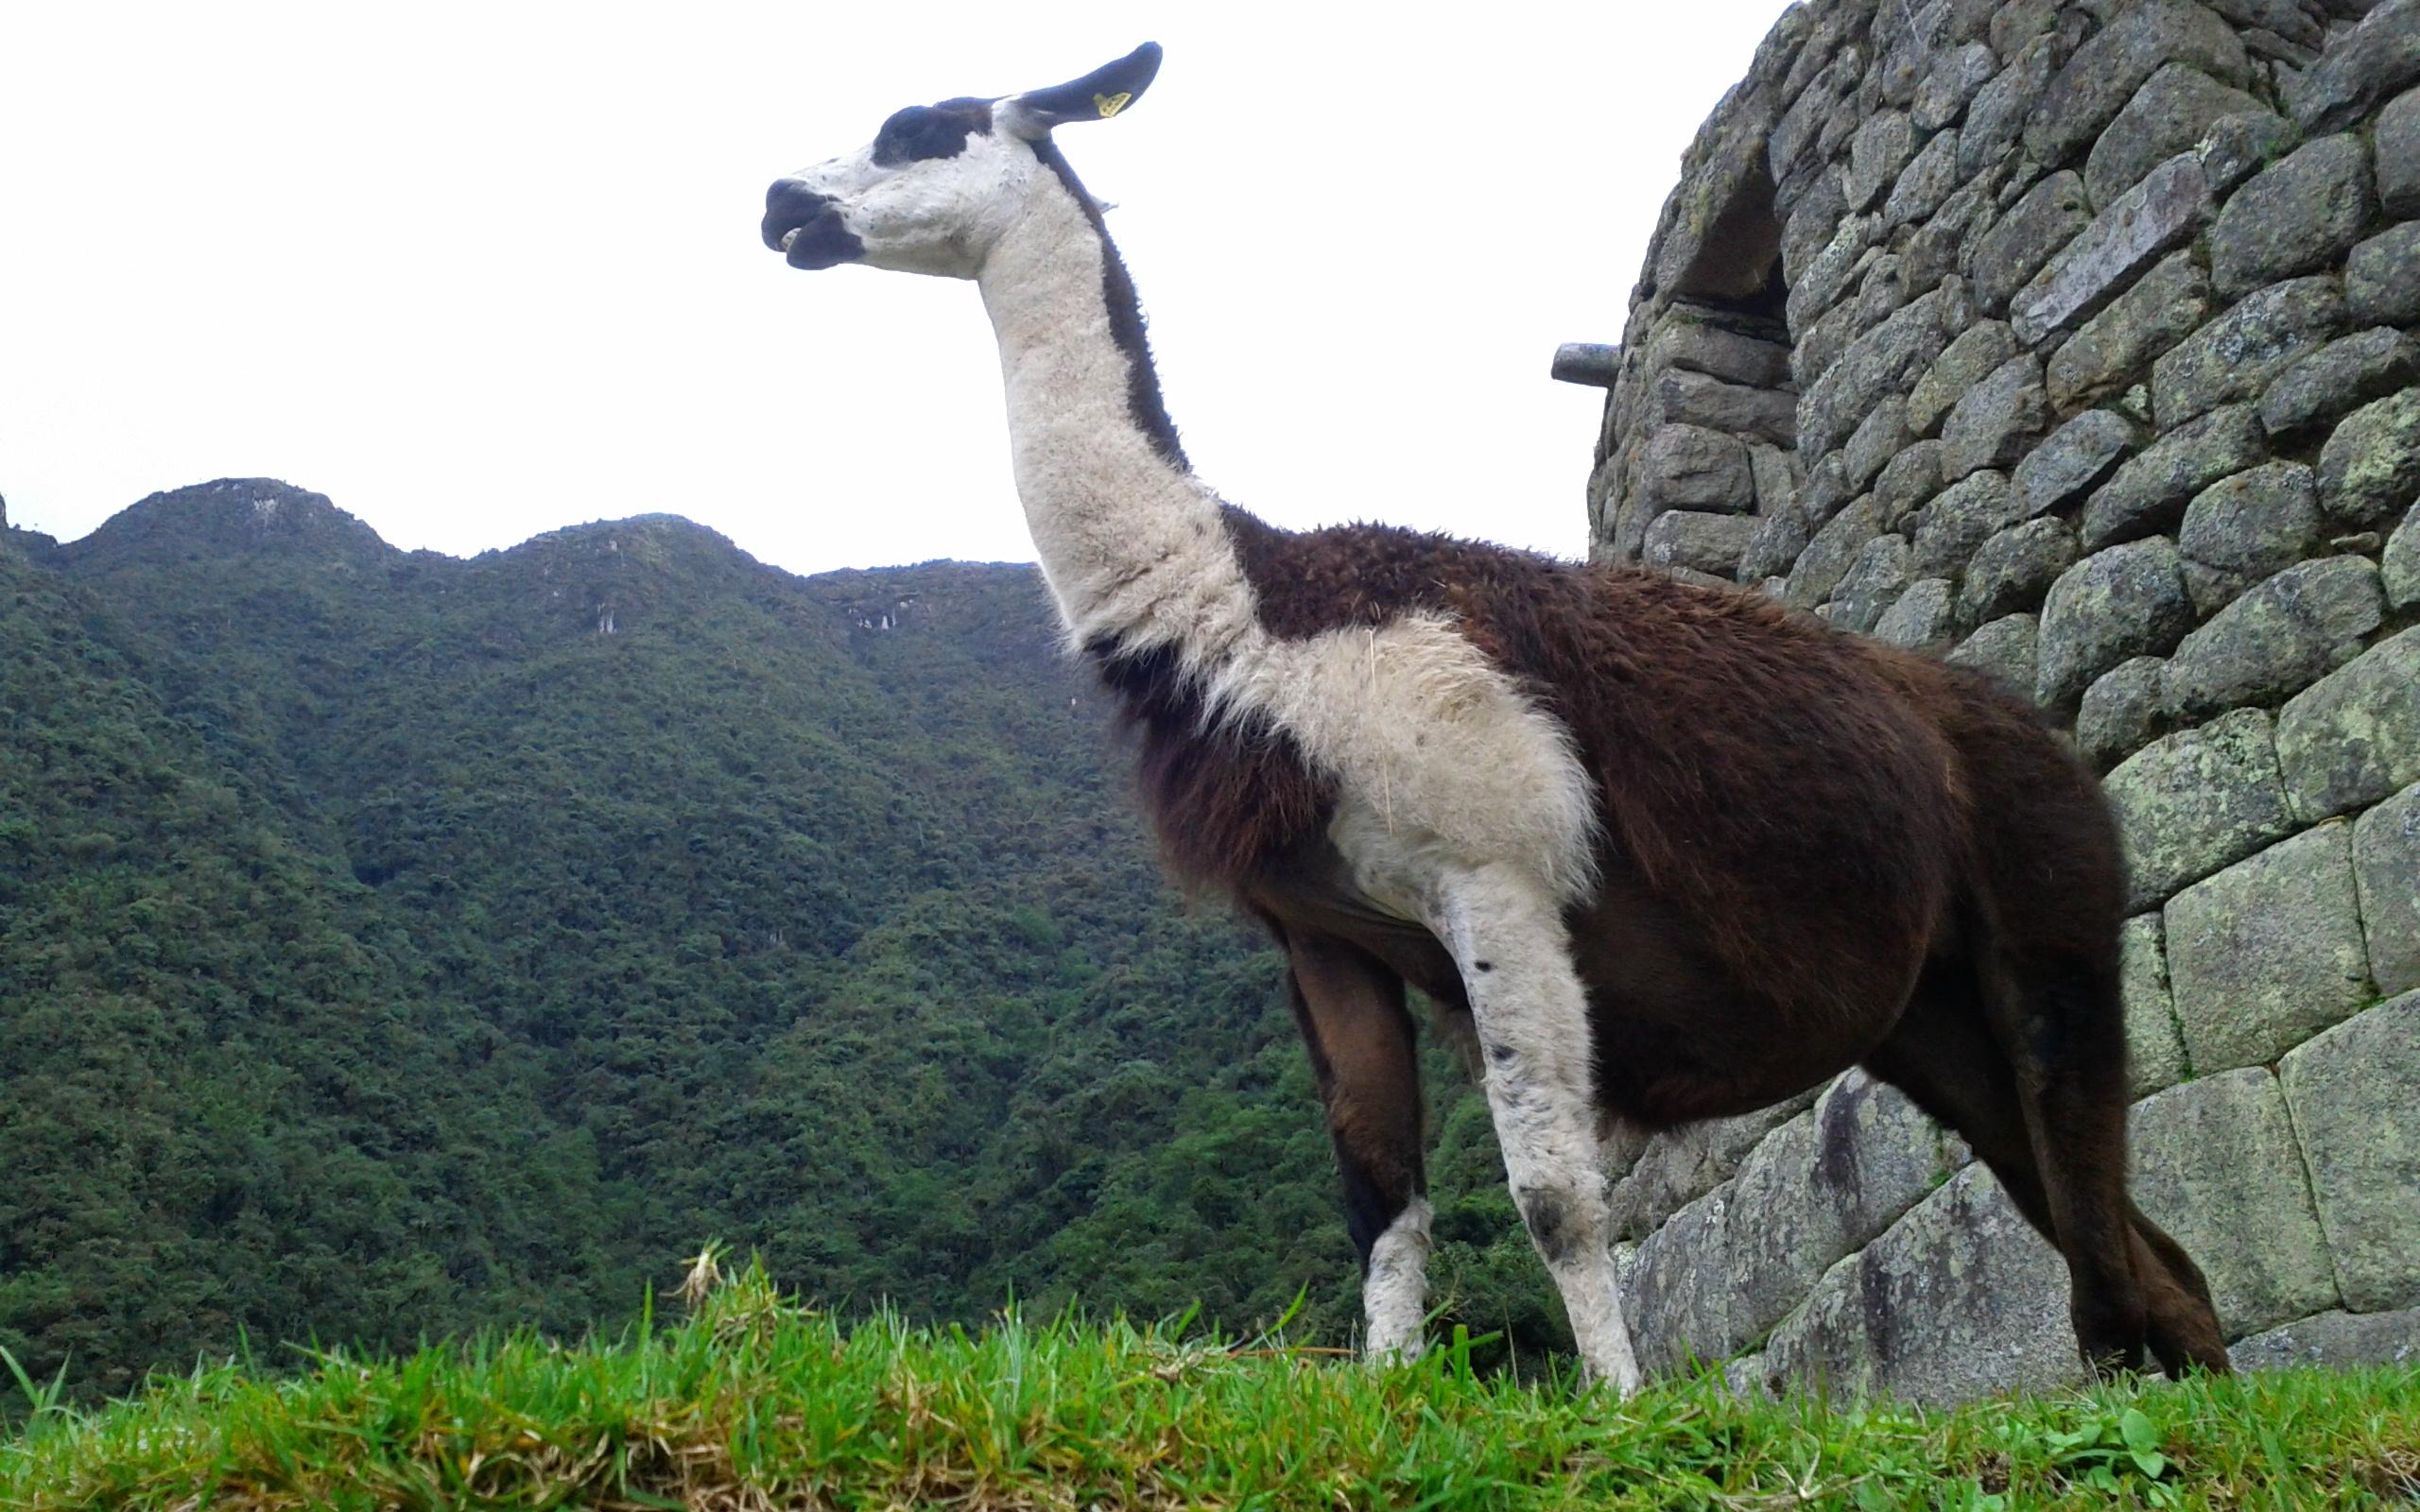 Alpaca Full HD Fondo De Pantalla And Fondo De Escritorio